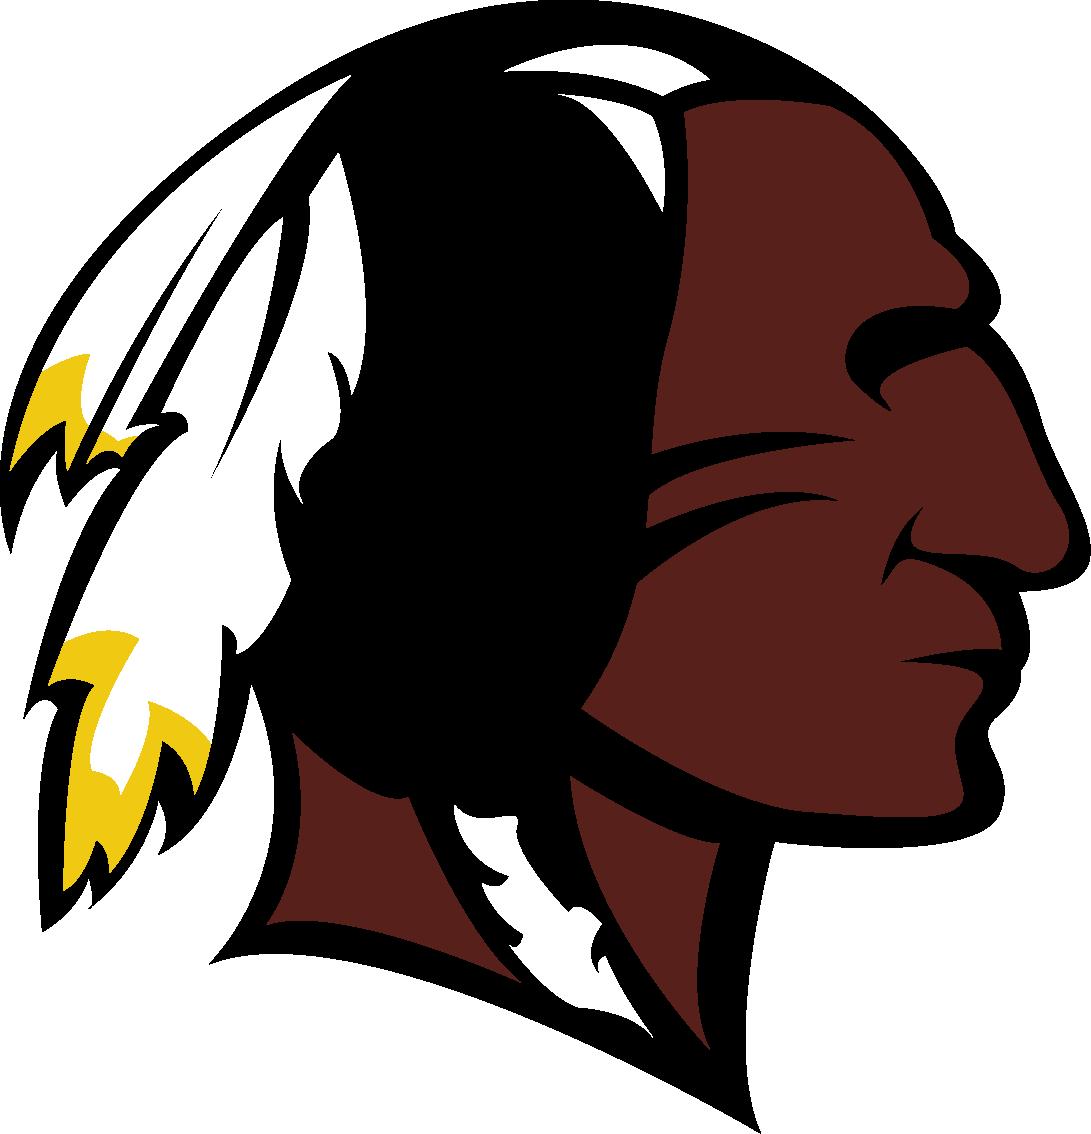 Free Washington Redskins PNG Transparent Images, Download.